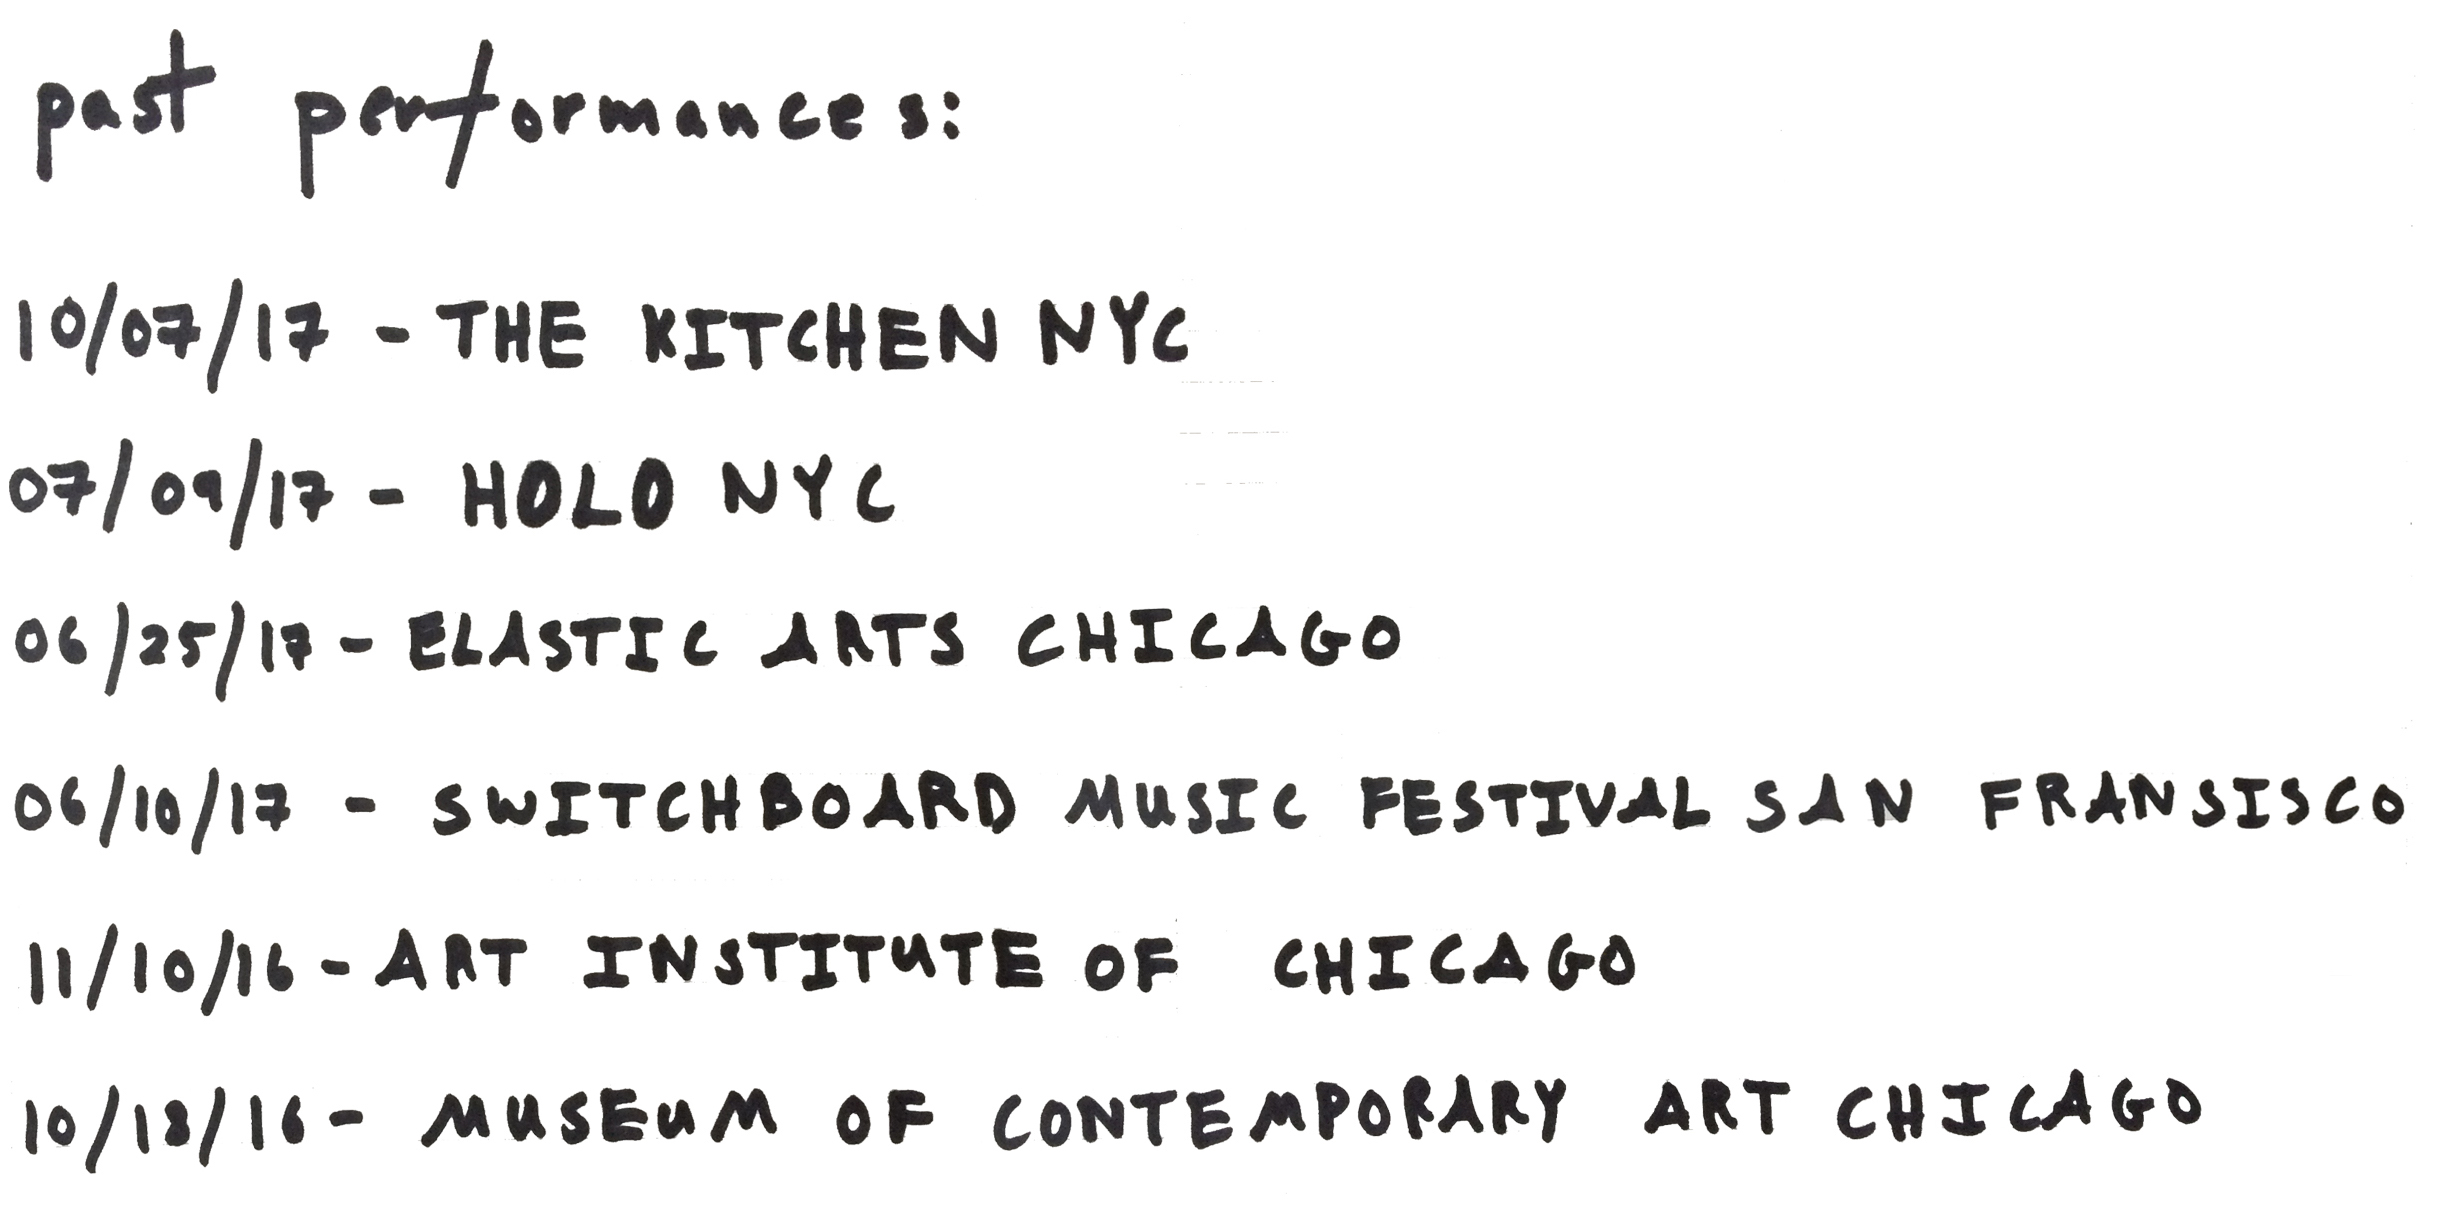 mbtrp past performances handwritten 1.jpg